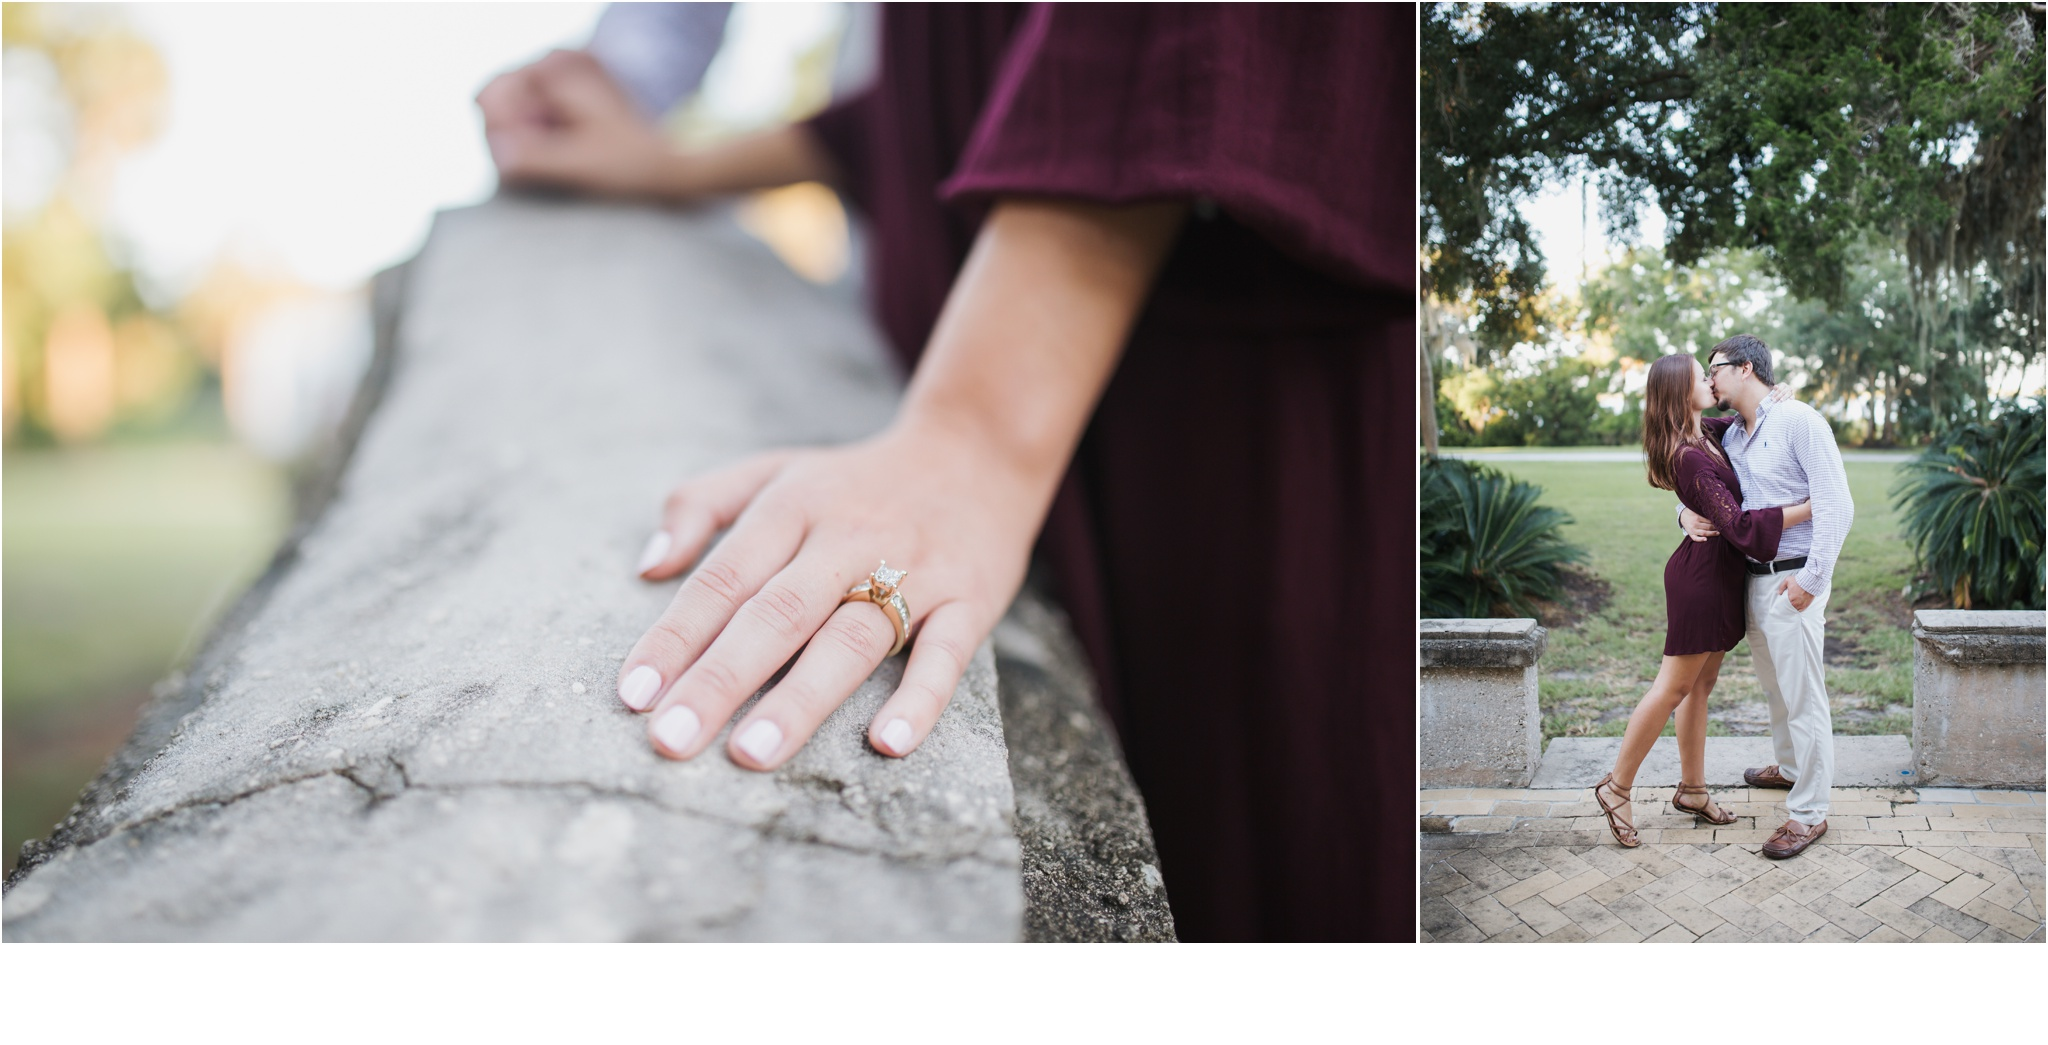 Rainey_Gregg_Photography_St._Simons_Island_Georgia_California_Wedding_Portrait_Photography_1372.jpg